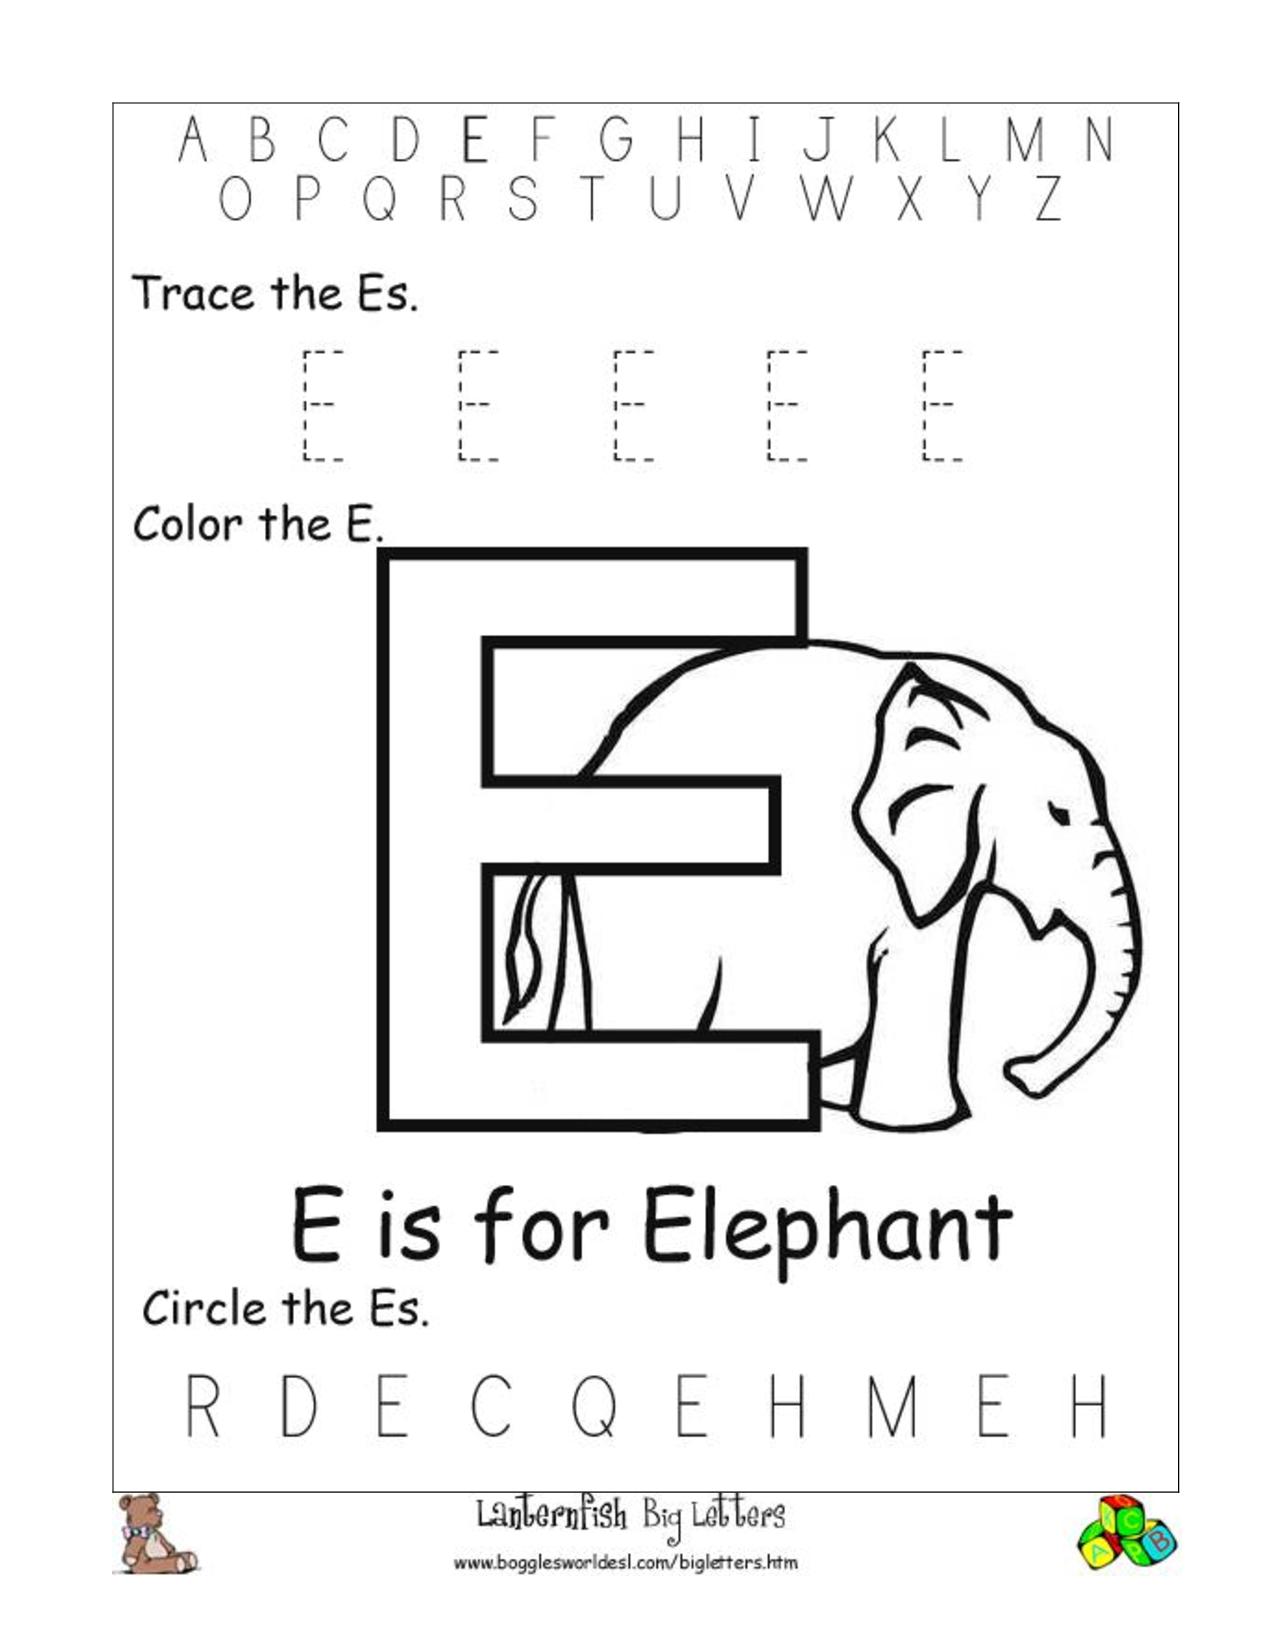 6 Best Images of Printable Preschool Worksheets Letter E ...